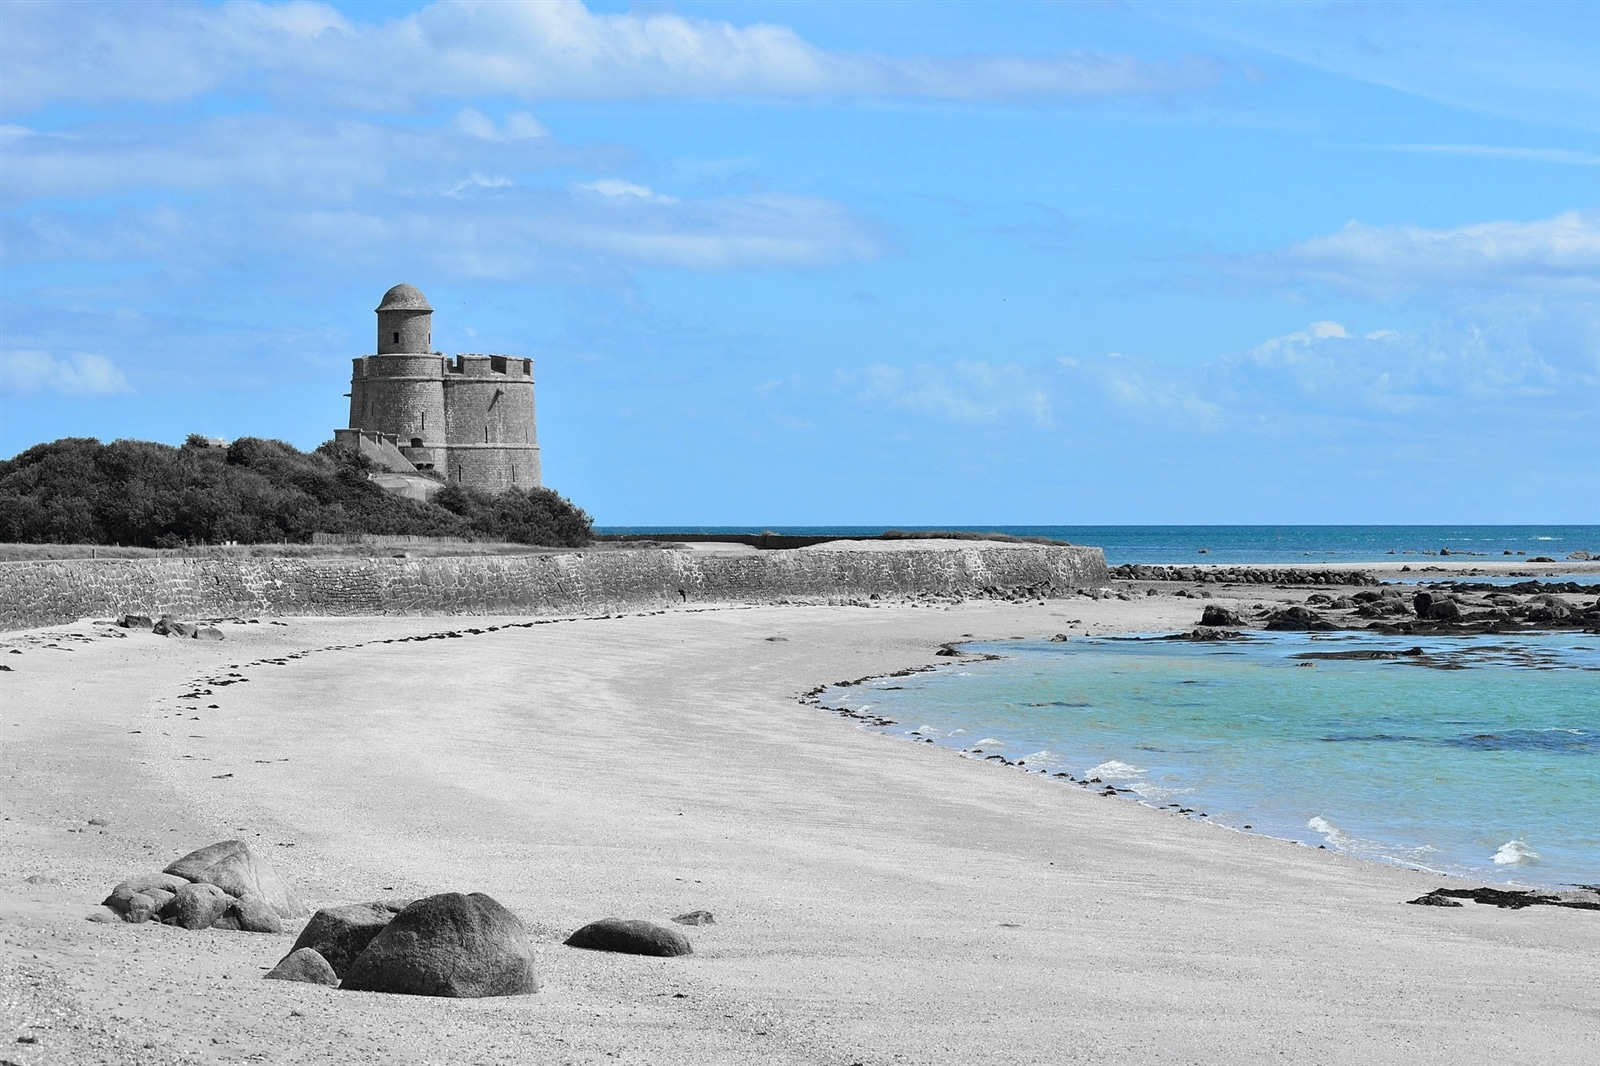 horaires marées Saint-Vaast-la-Hougue